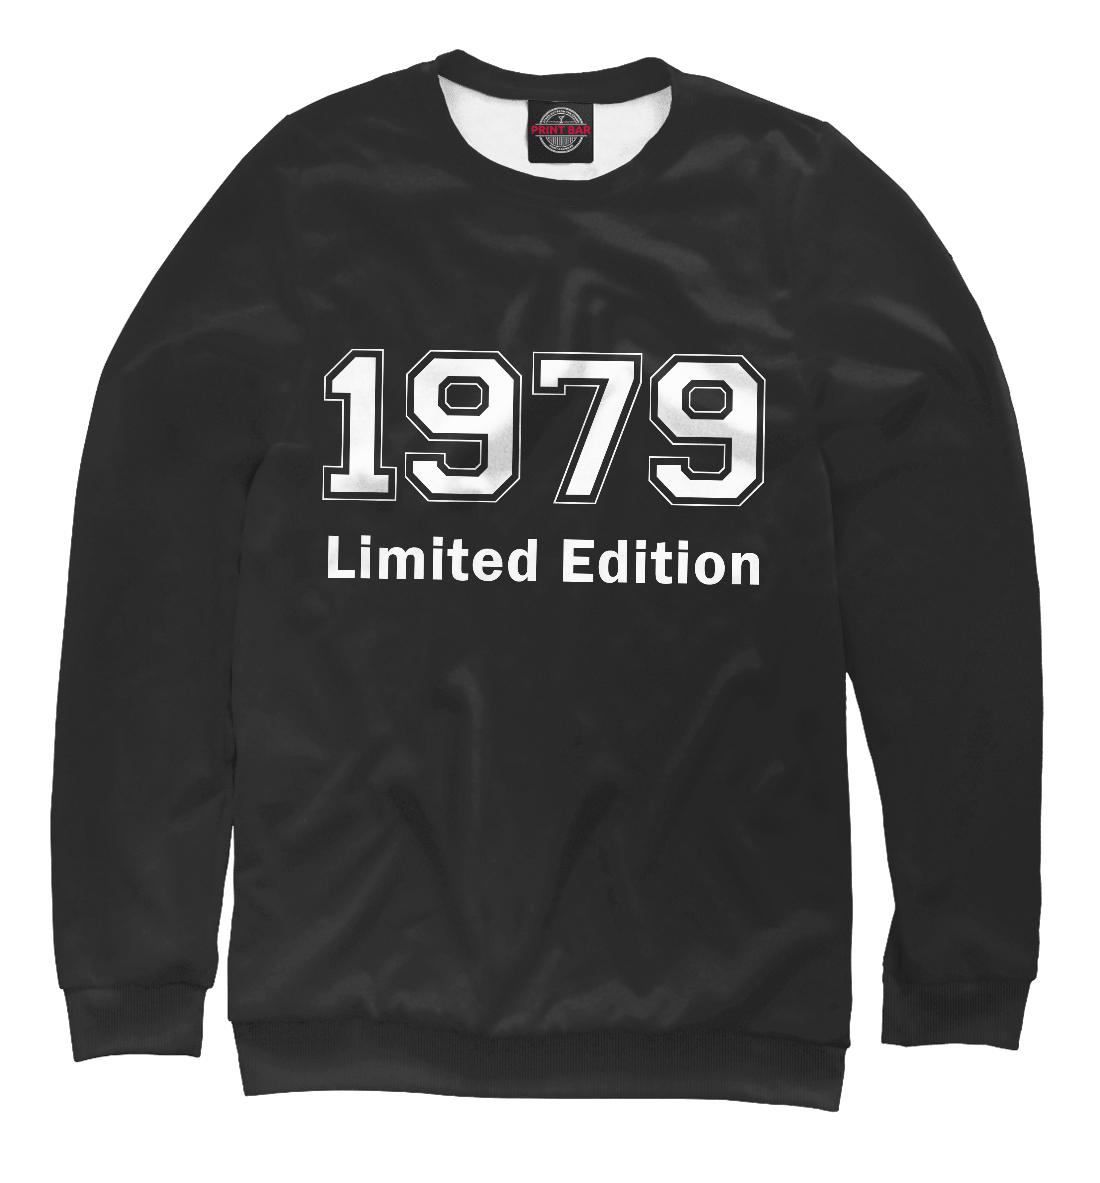 Купить 1979 Limited Edition, Printbar, Свитшоты, DSD-252270-swi-2